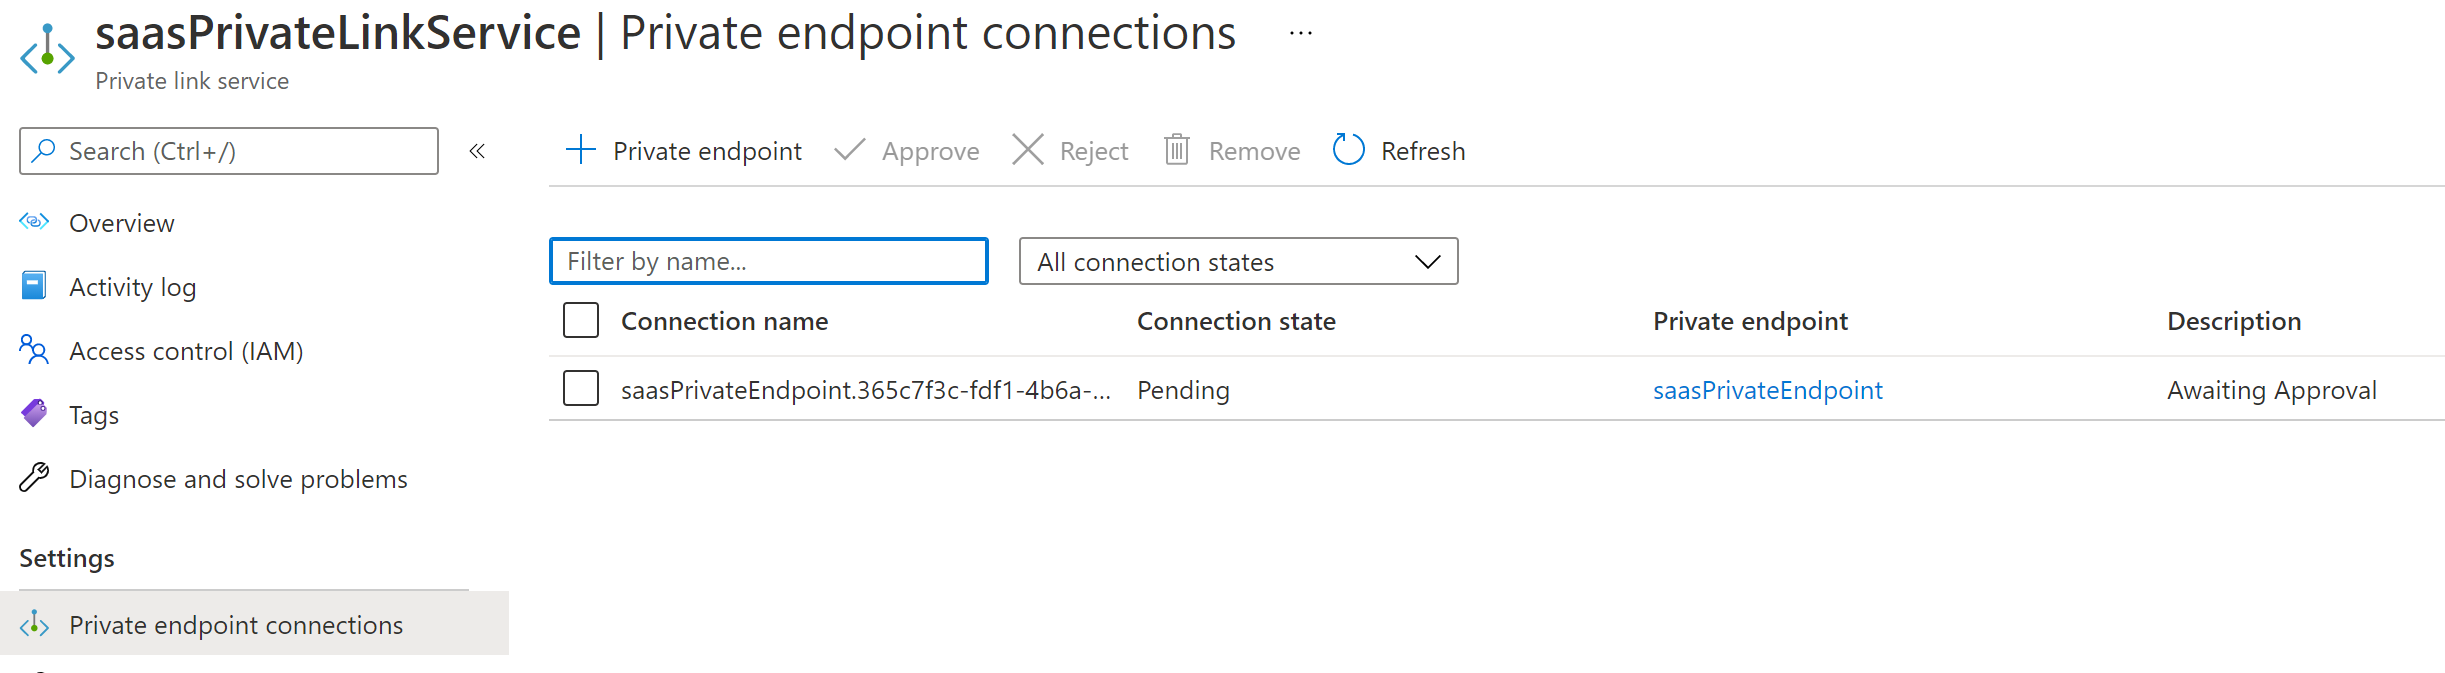 Connection request